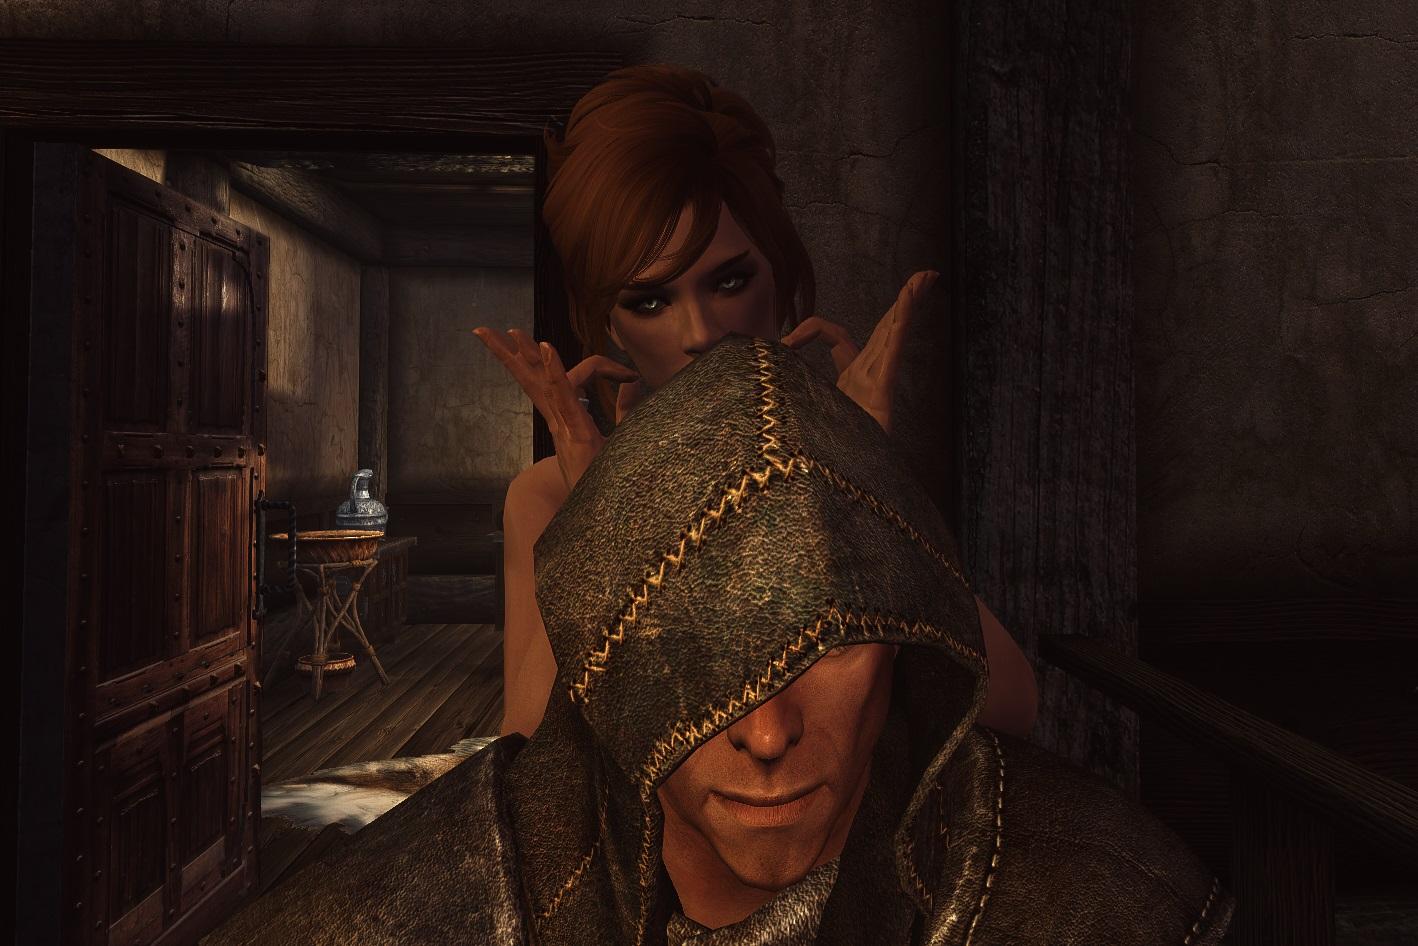 Iue - Elder Scrolls 5: Skyrim, the